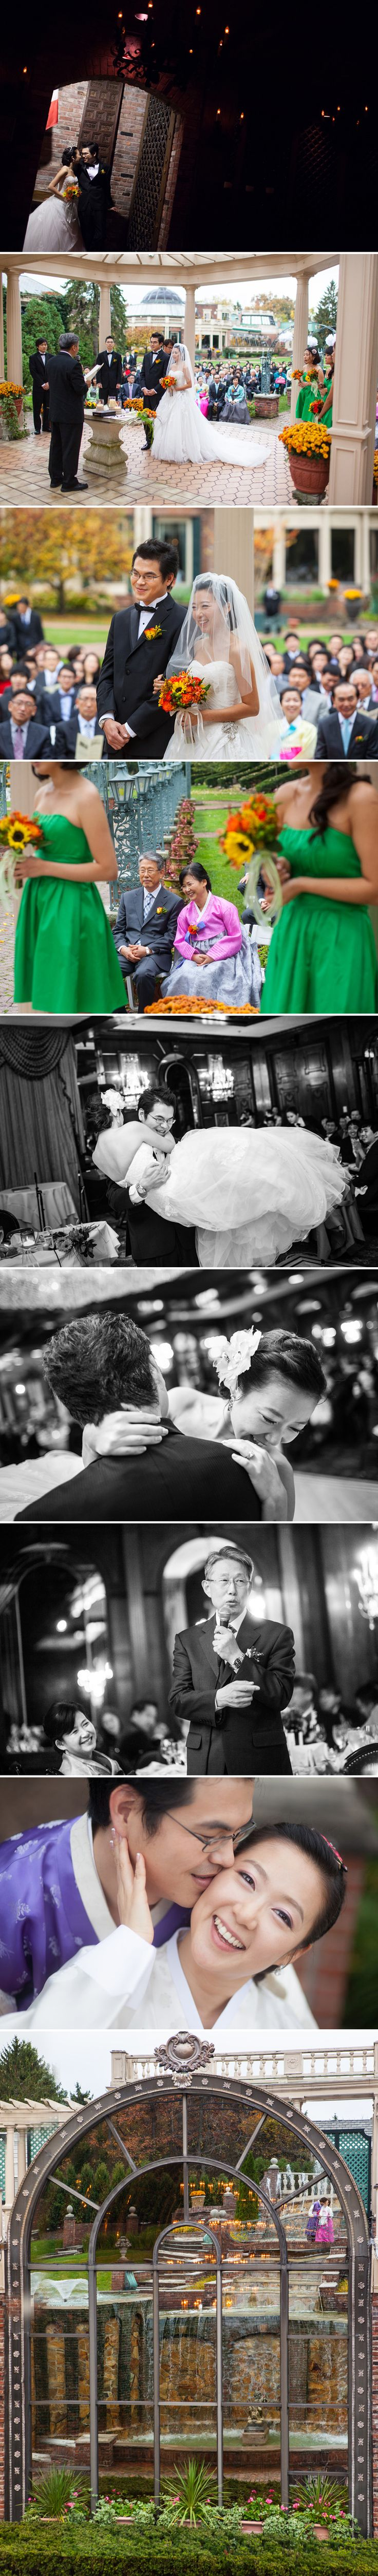 INSUK AND HYEJIN: THE MANOR WEDDING IN WEST ORANGE